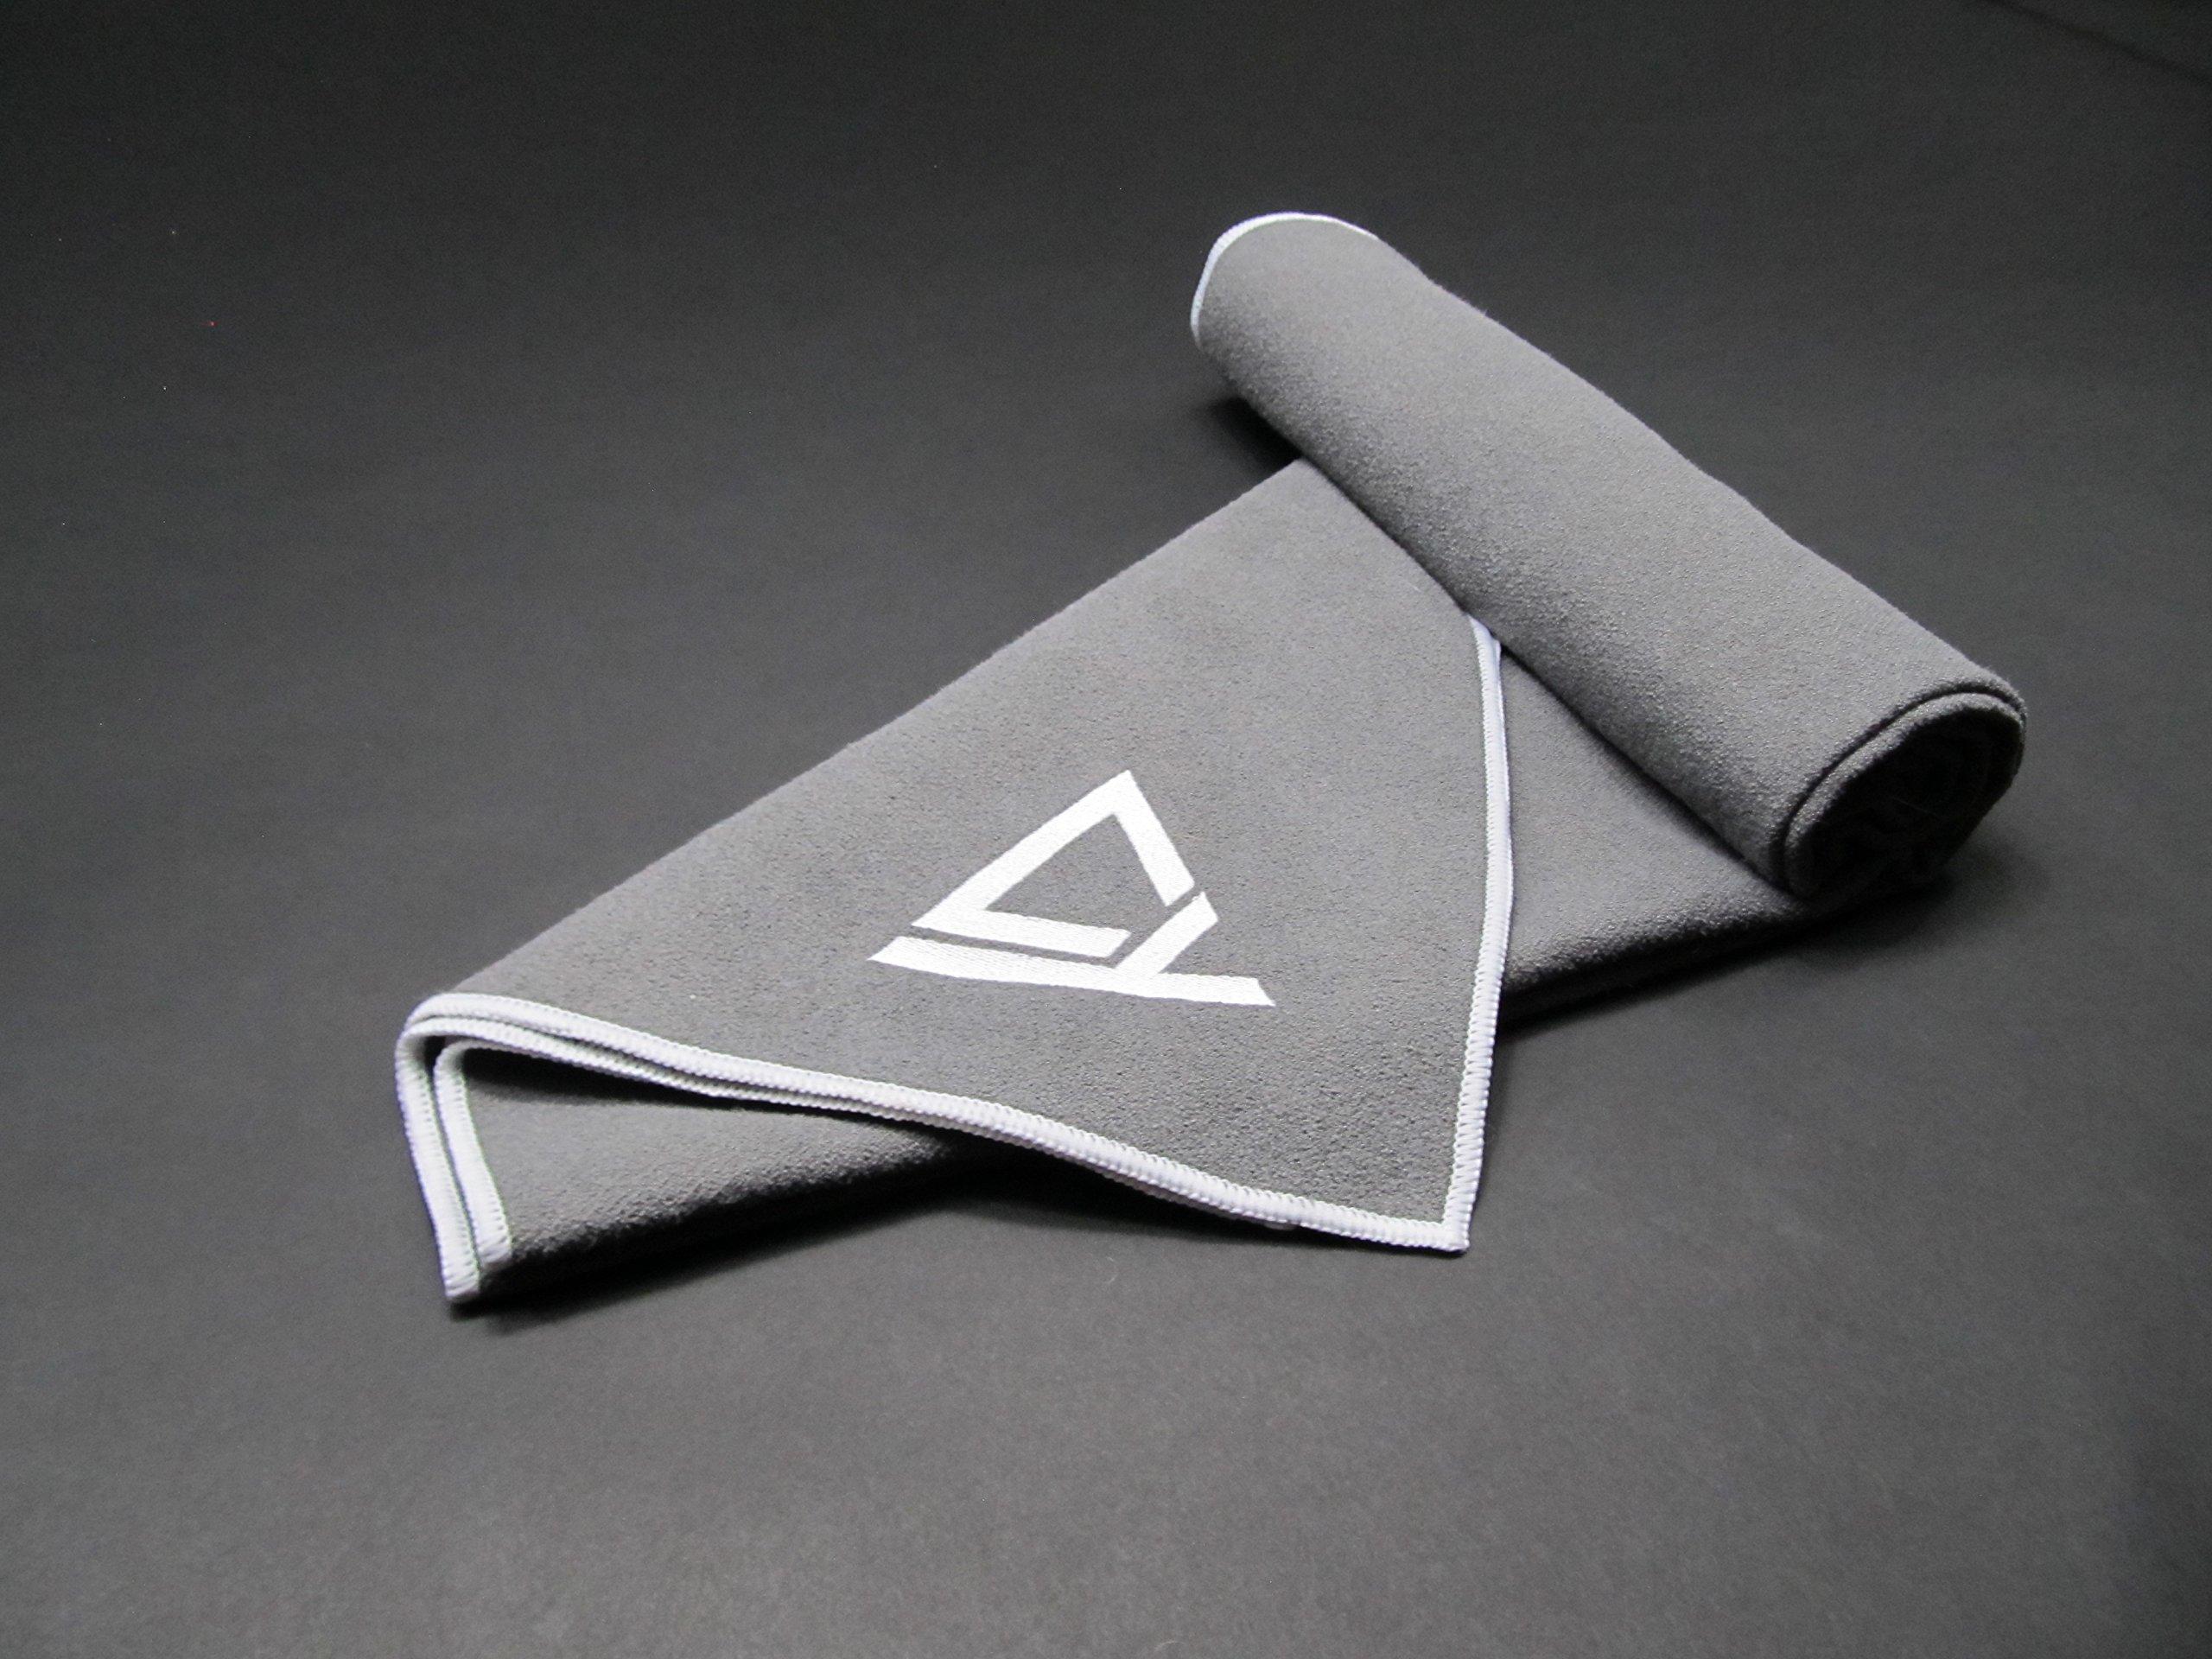 Crush Hot Yoga Towel - Non-Slip - Absorbent - Rubberized - 100% Microfiber - Washable - Soft - Perfect for Bikram